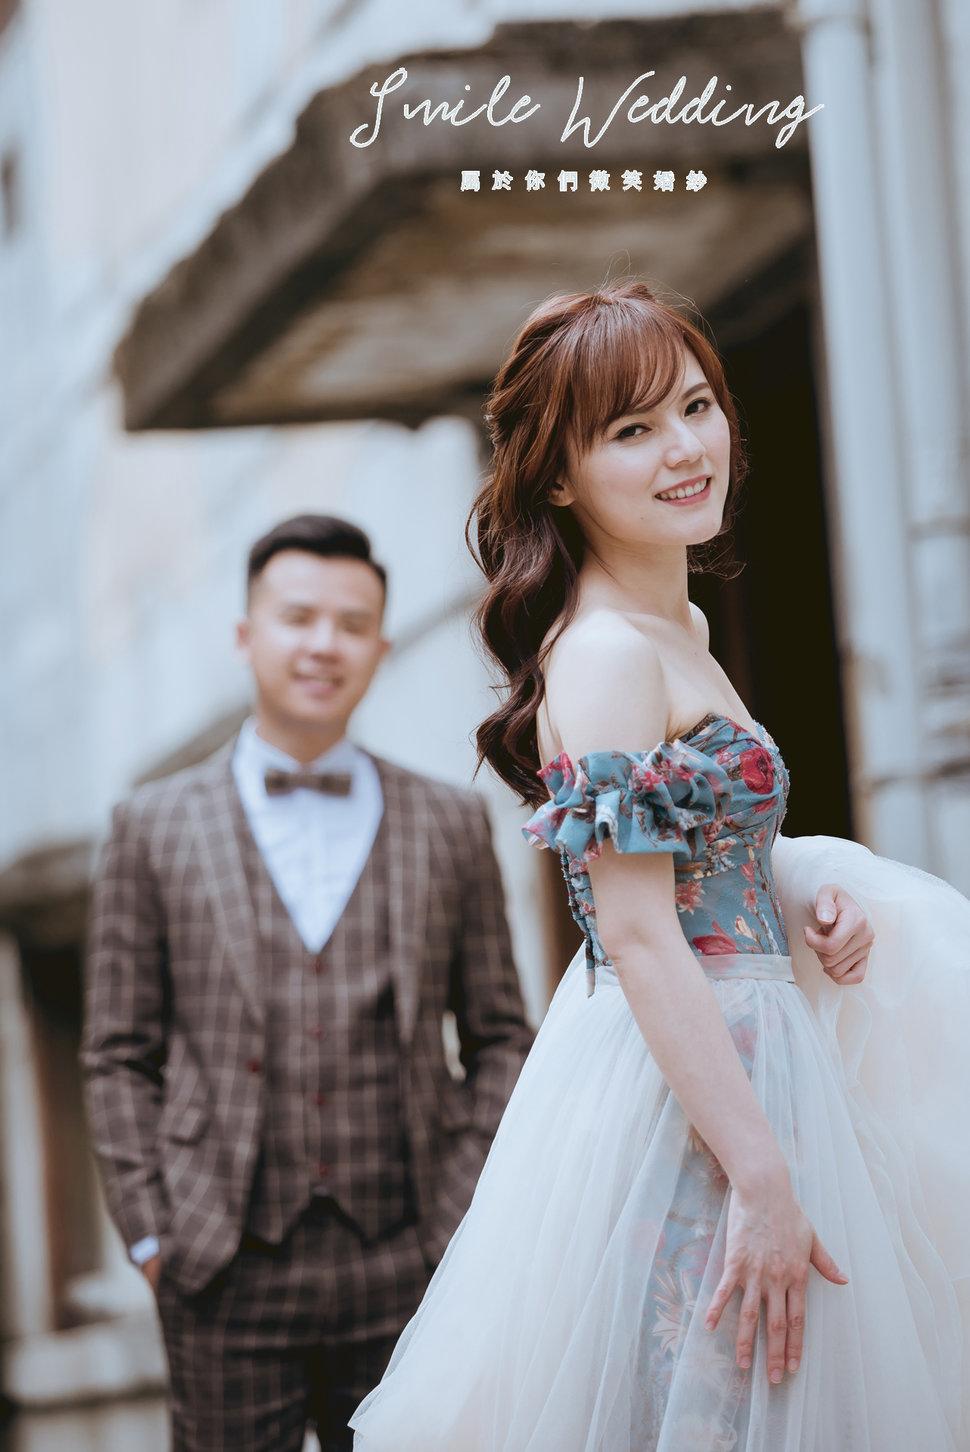 WEI_2775 - Smile wedding 微笑婚紗《結婚吧》